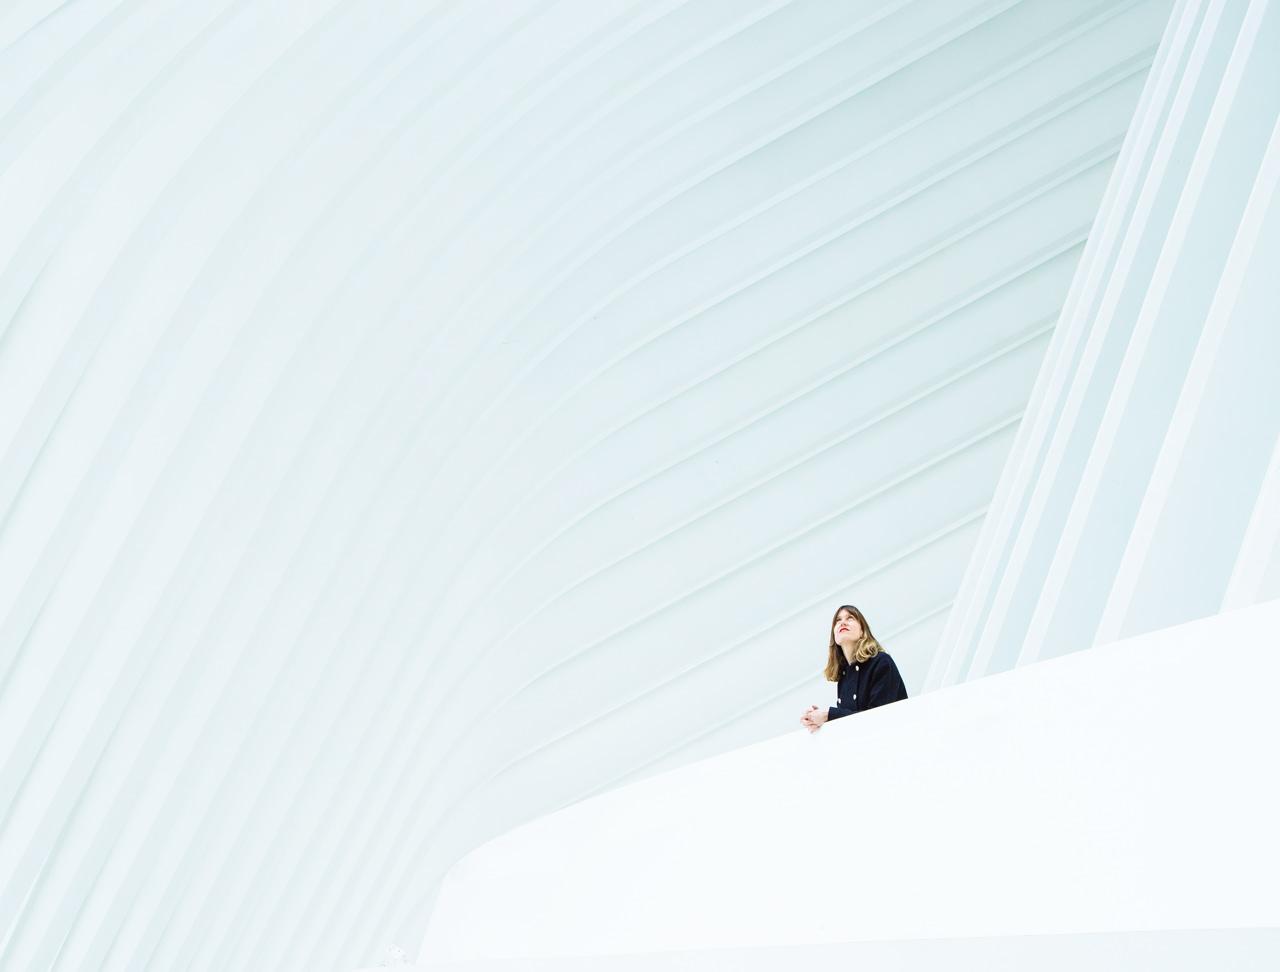 fotos de arquitectura calatrava oviedo maria cañal